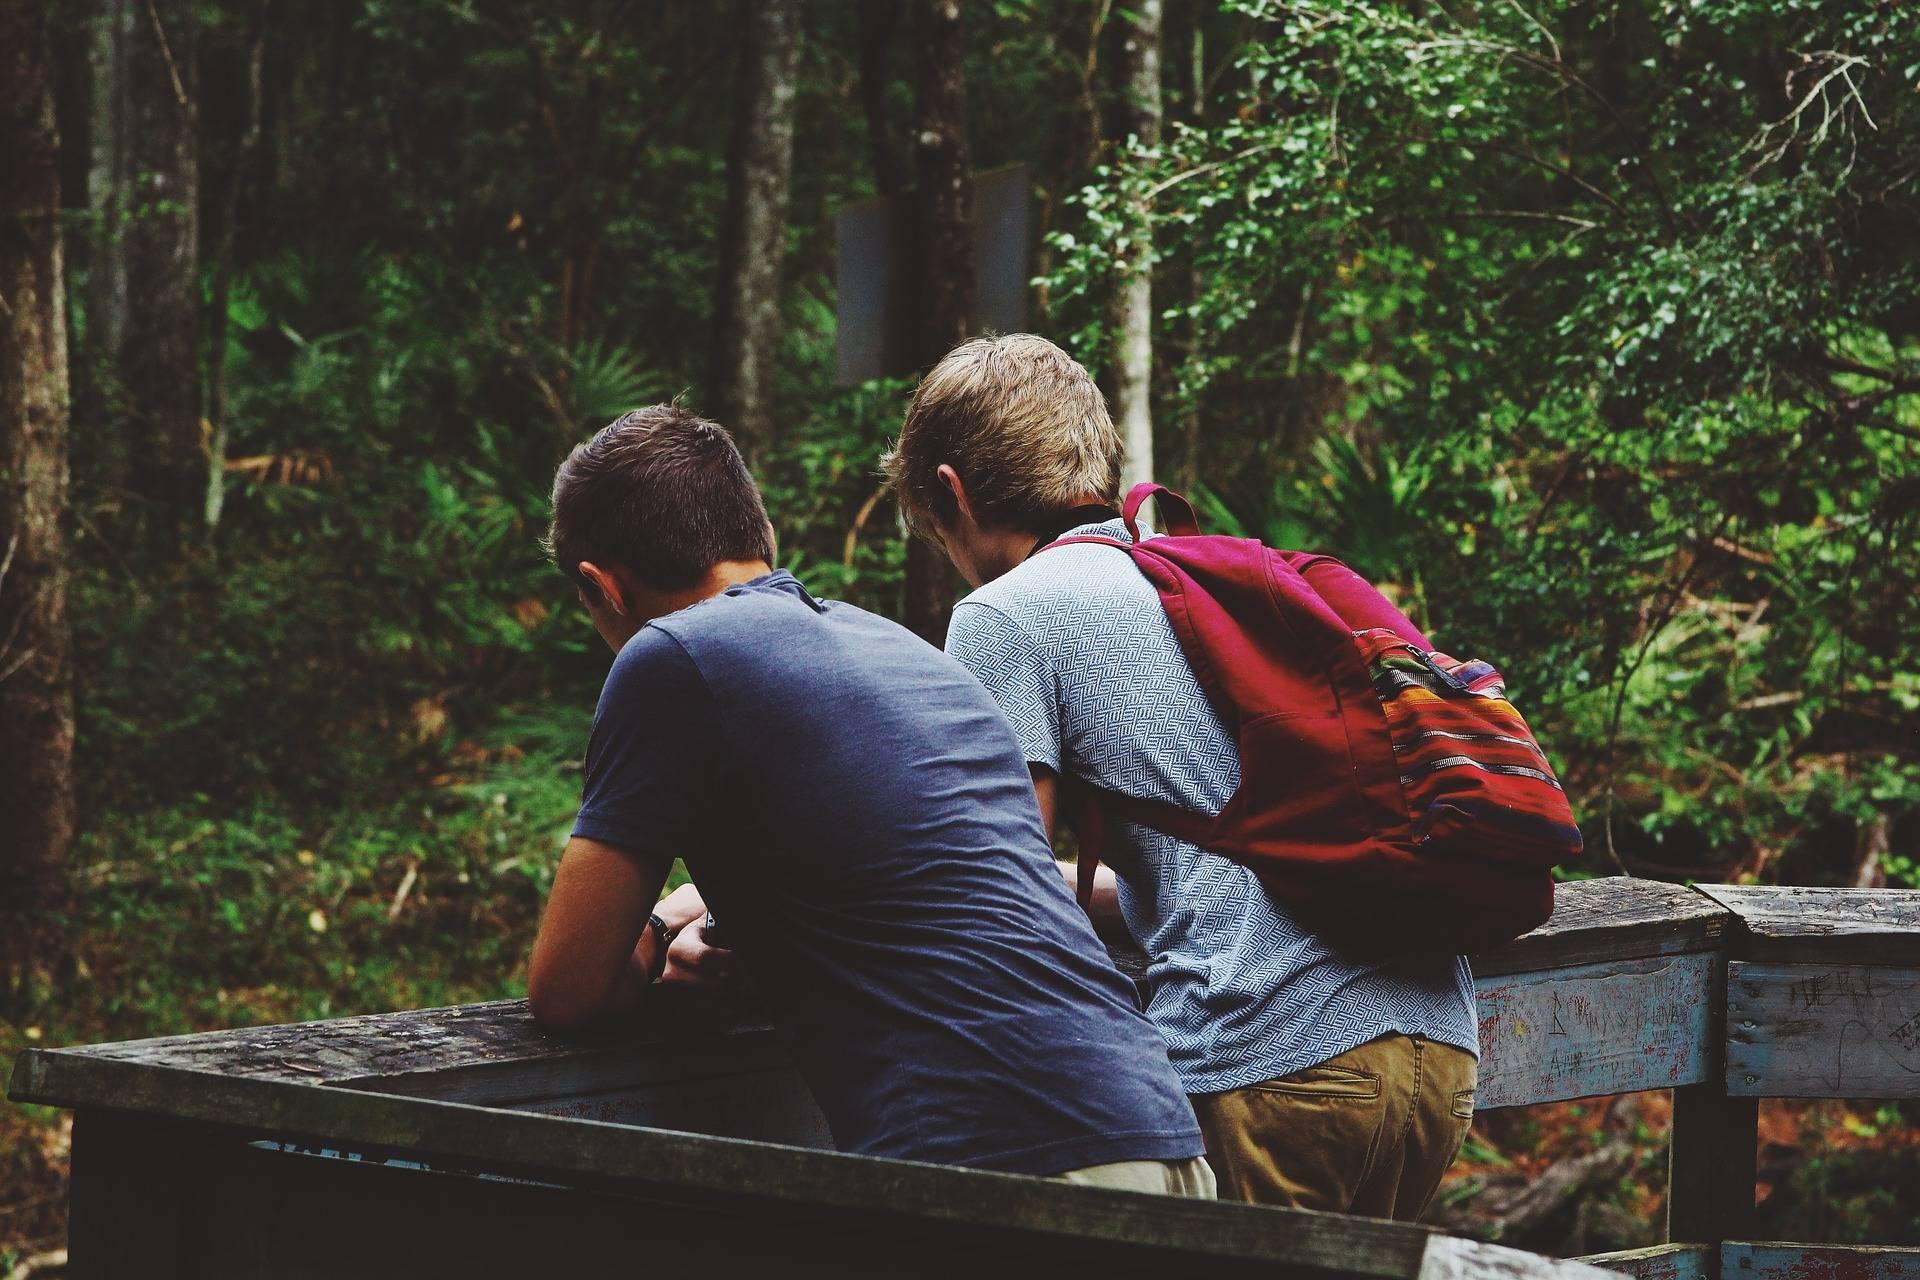 Как вежливо прекратить дружбу